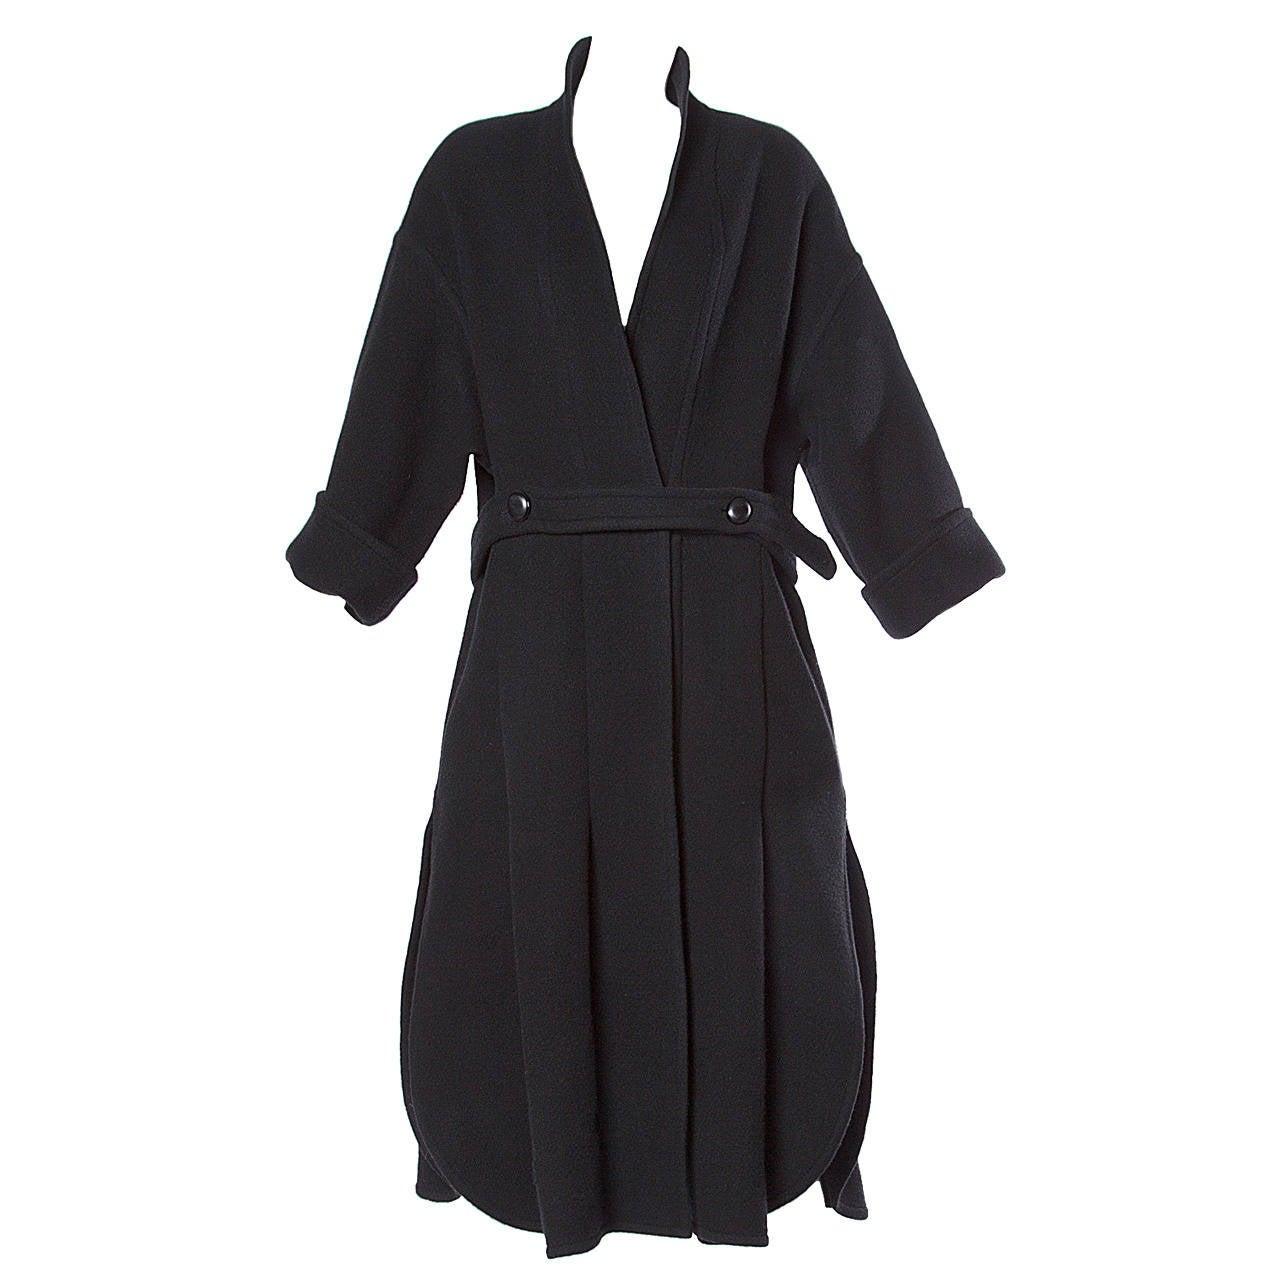 James Galanos for Neiman Marcus Unusual Black Wool/ Cashmere Vintage Coat